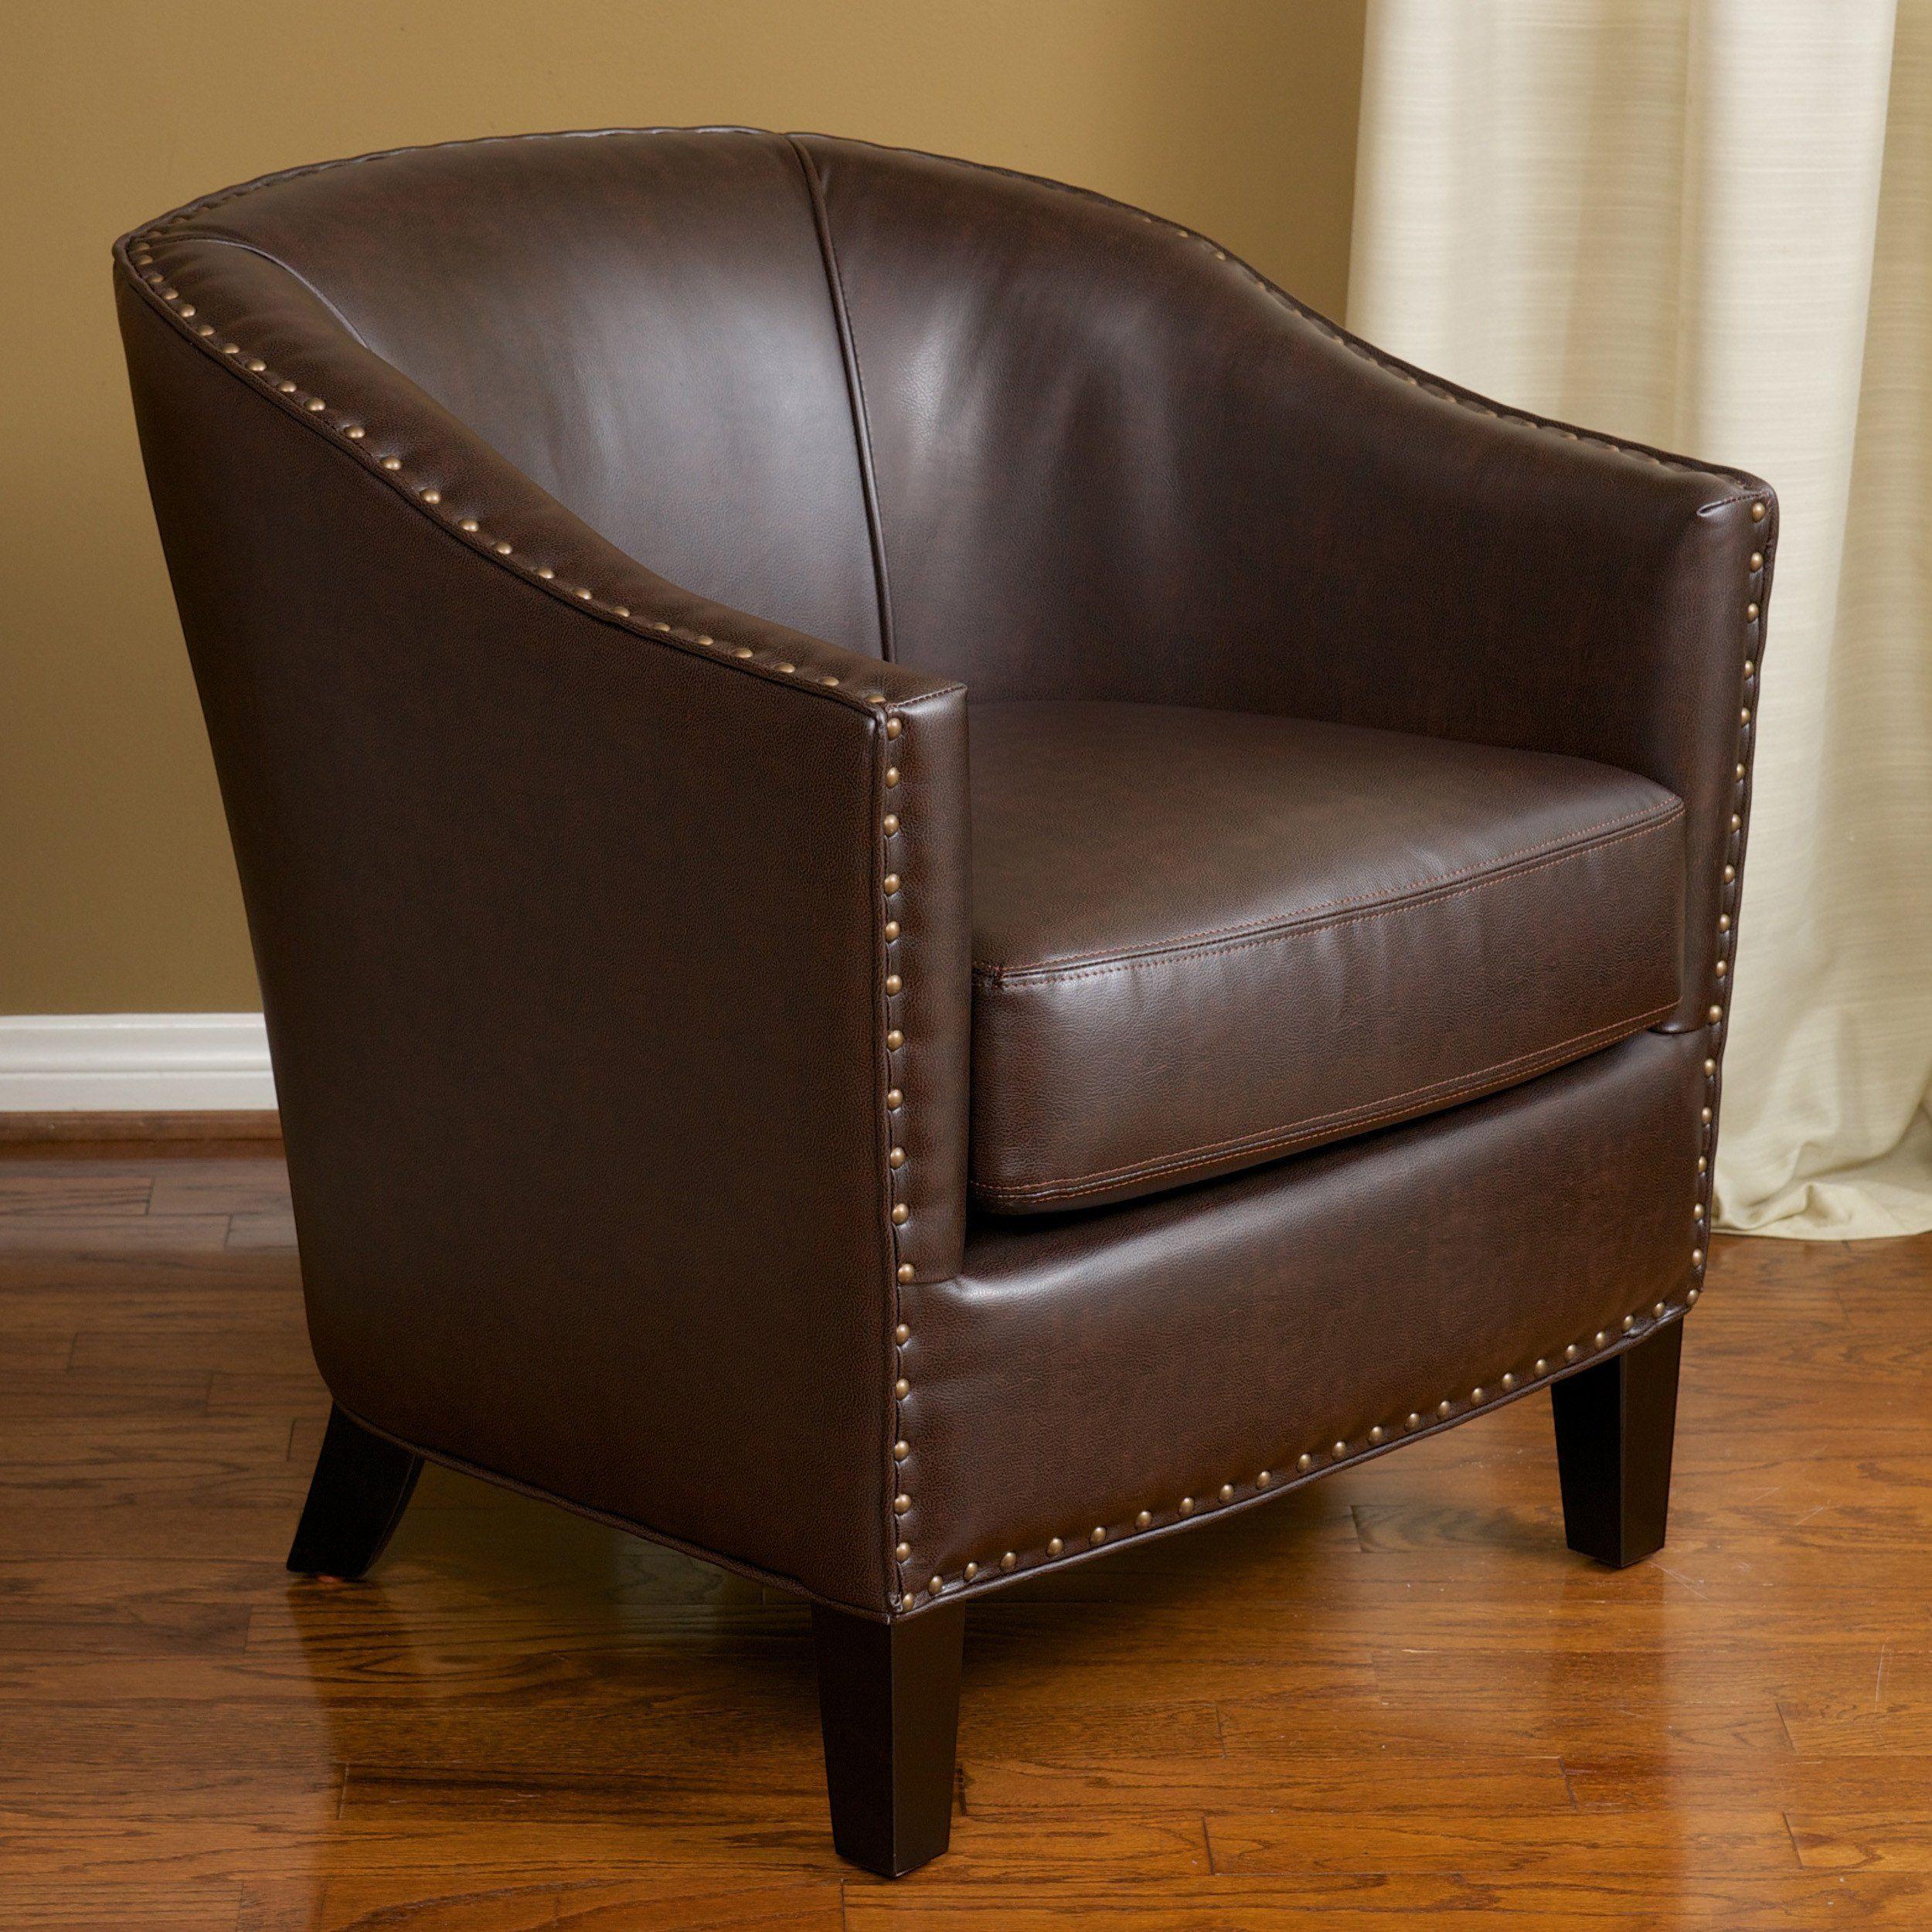 Carlton Mid Century Tub Style Club Chair | Tubs, Mid century and Modern